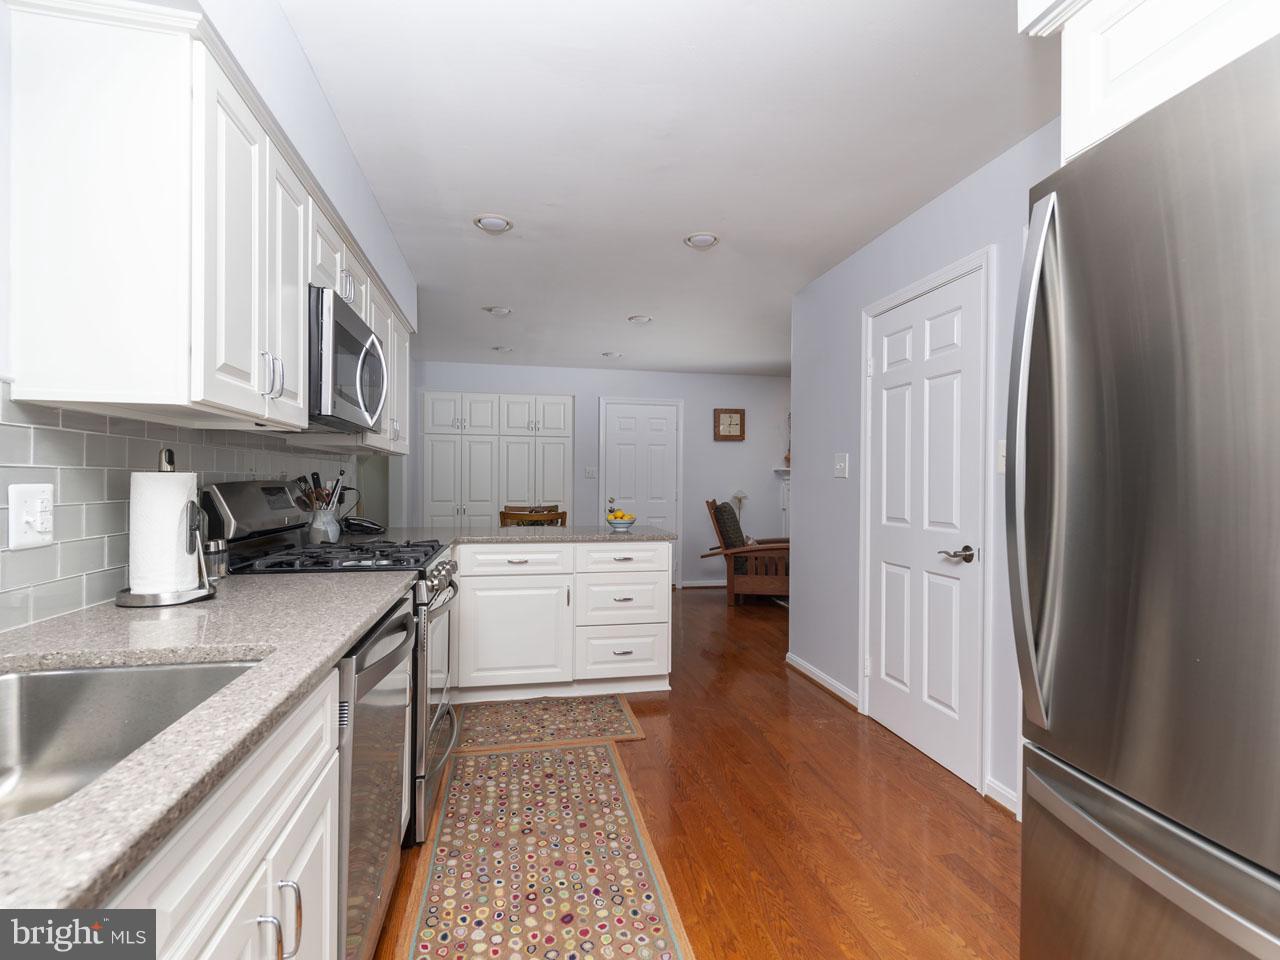 1006211278-300688039157-2021-07-22-07-39-39        Burke Delaware Real Estate For Sale   MLS# 1006211278  - Best of Northern Virginia